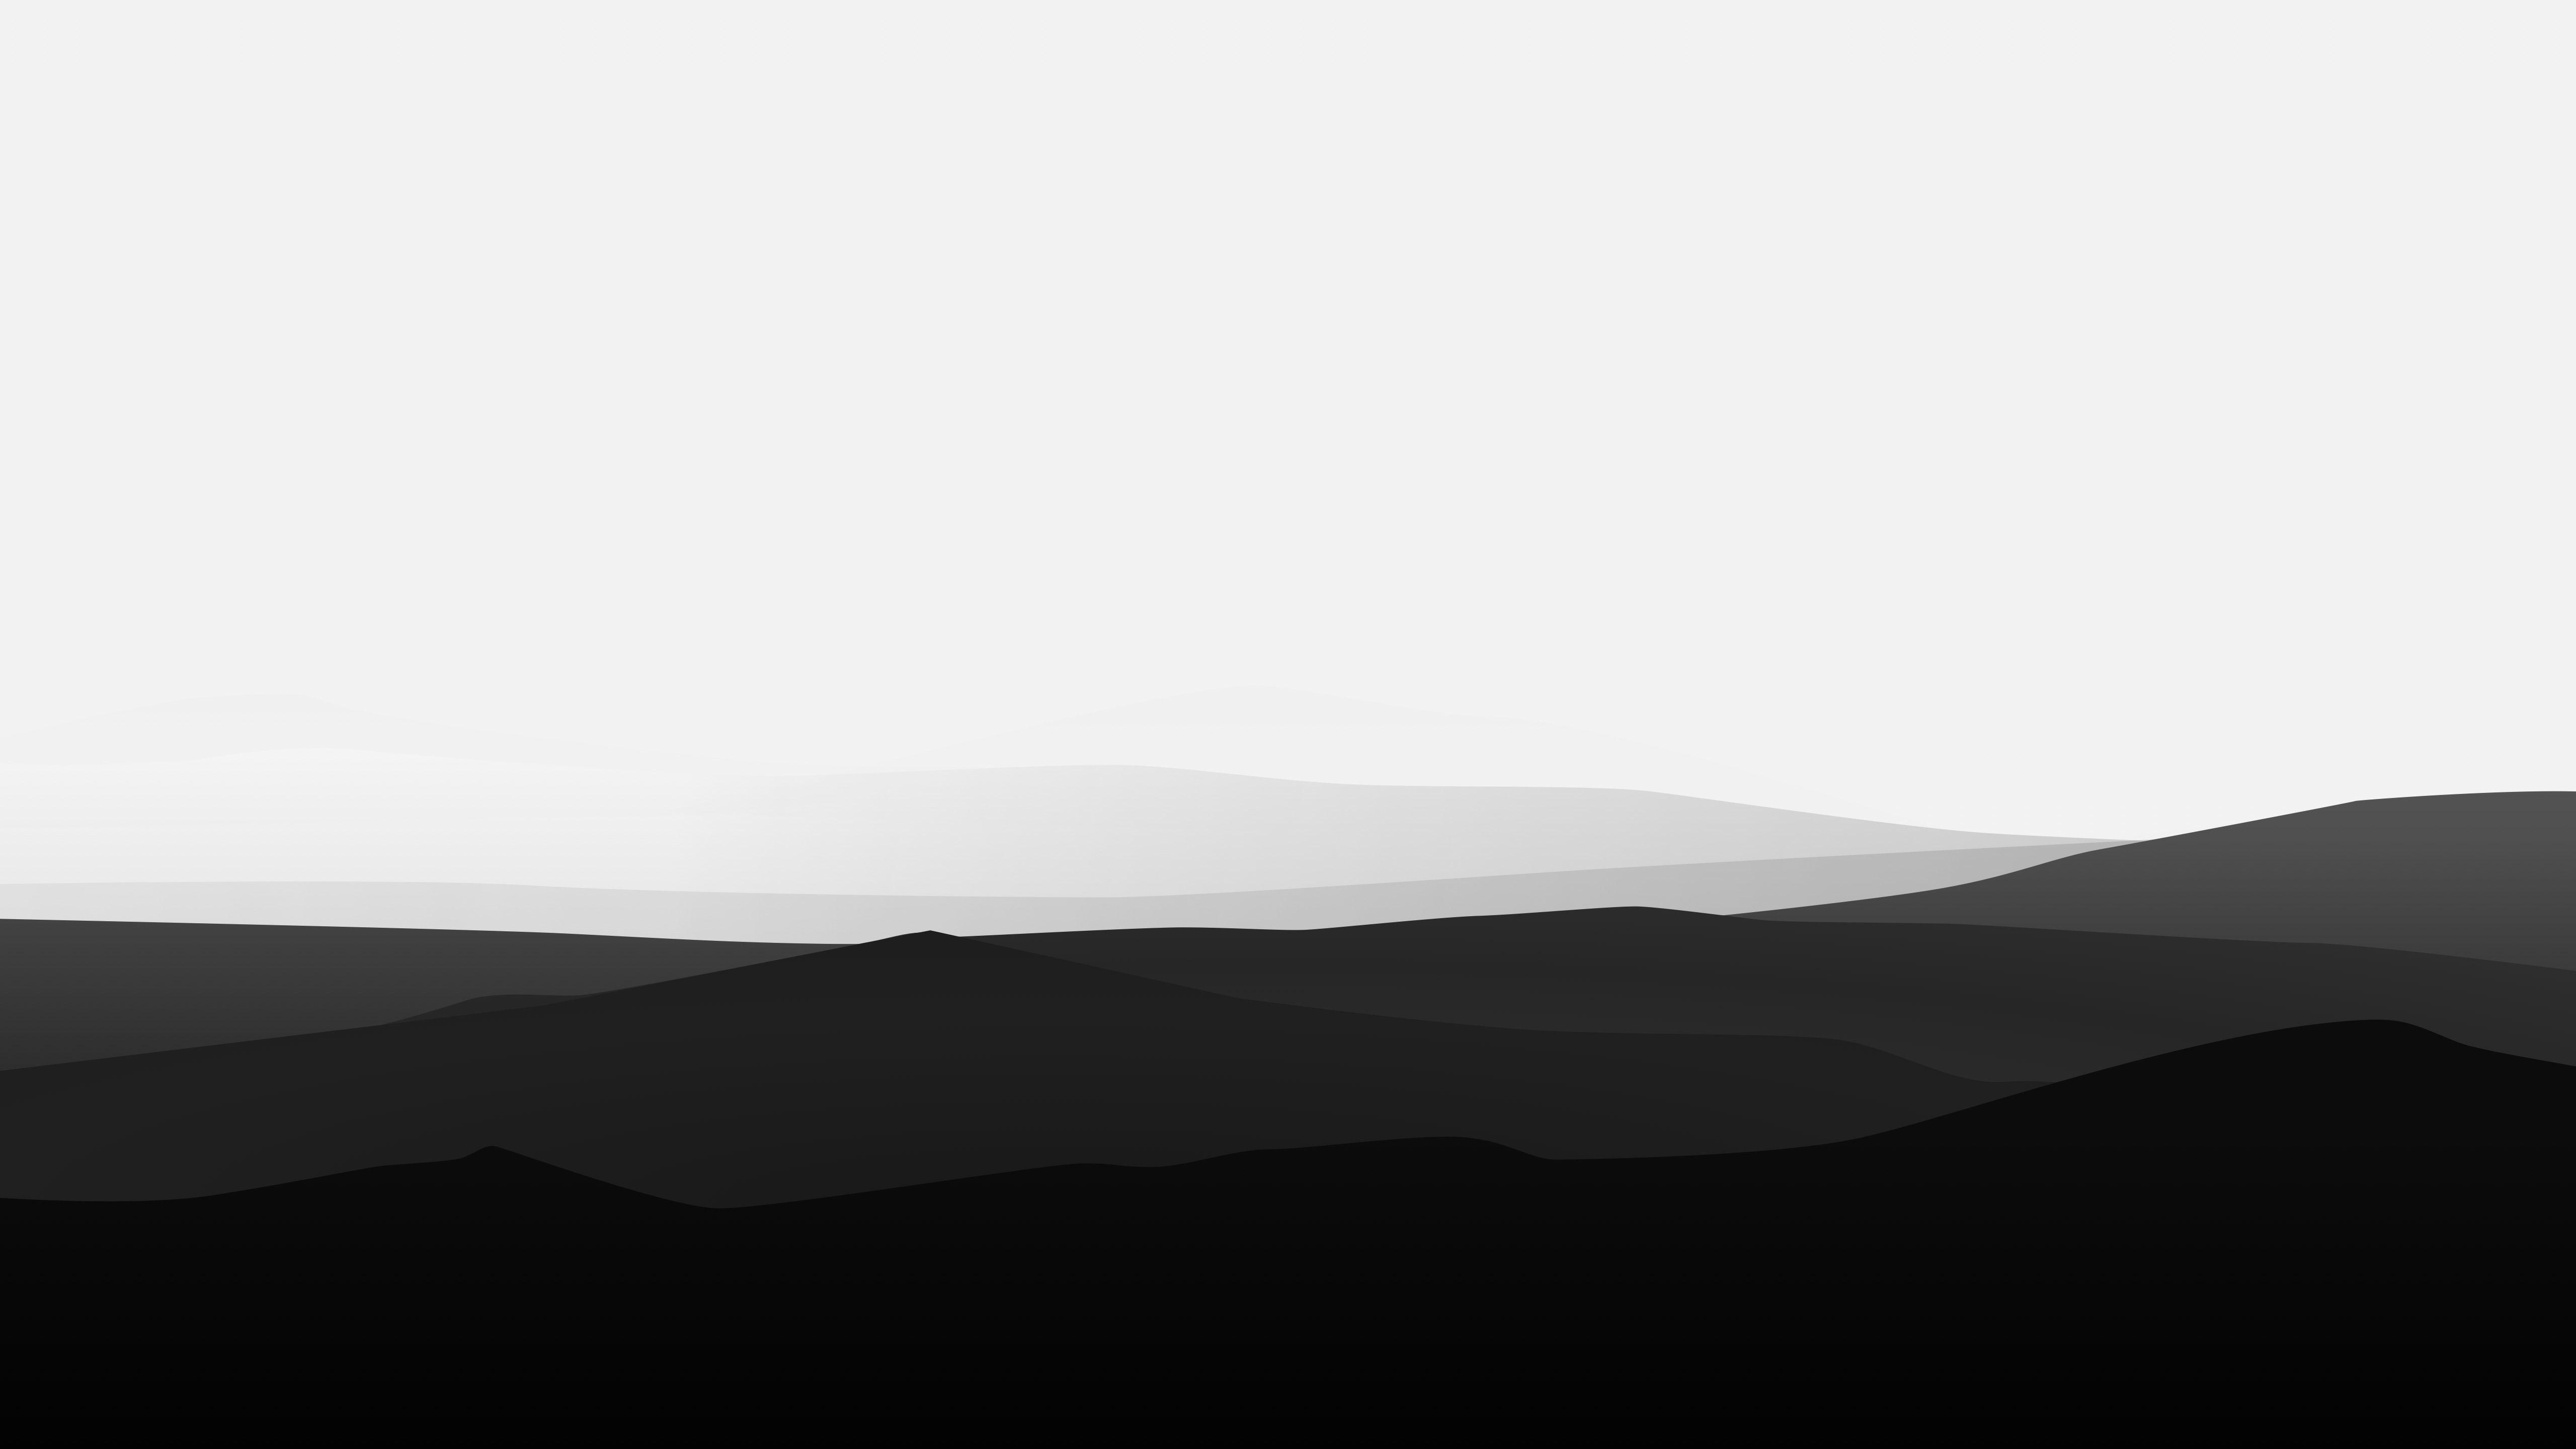 White Minimalist Wallpapers   Top White Minimalist 5120x2880